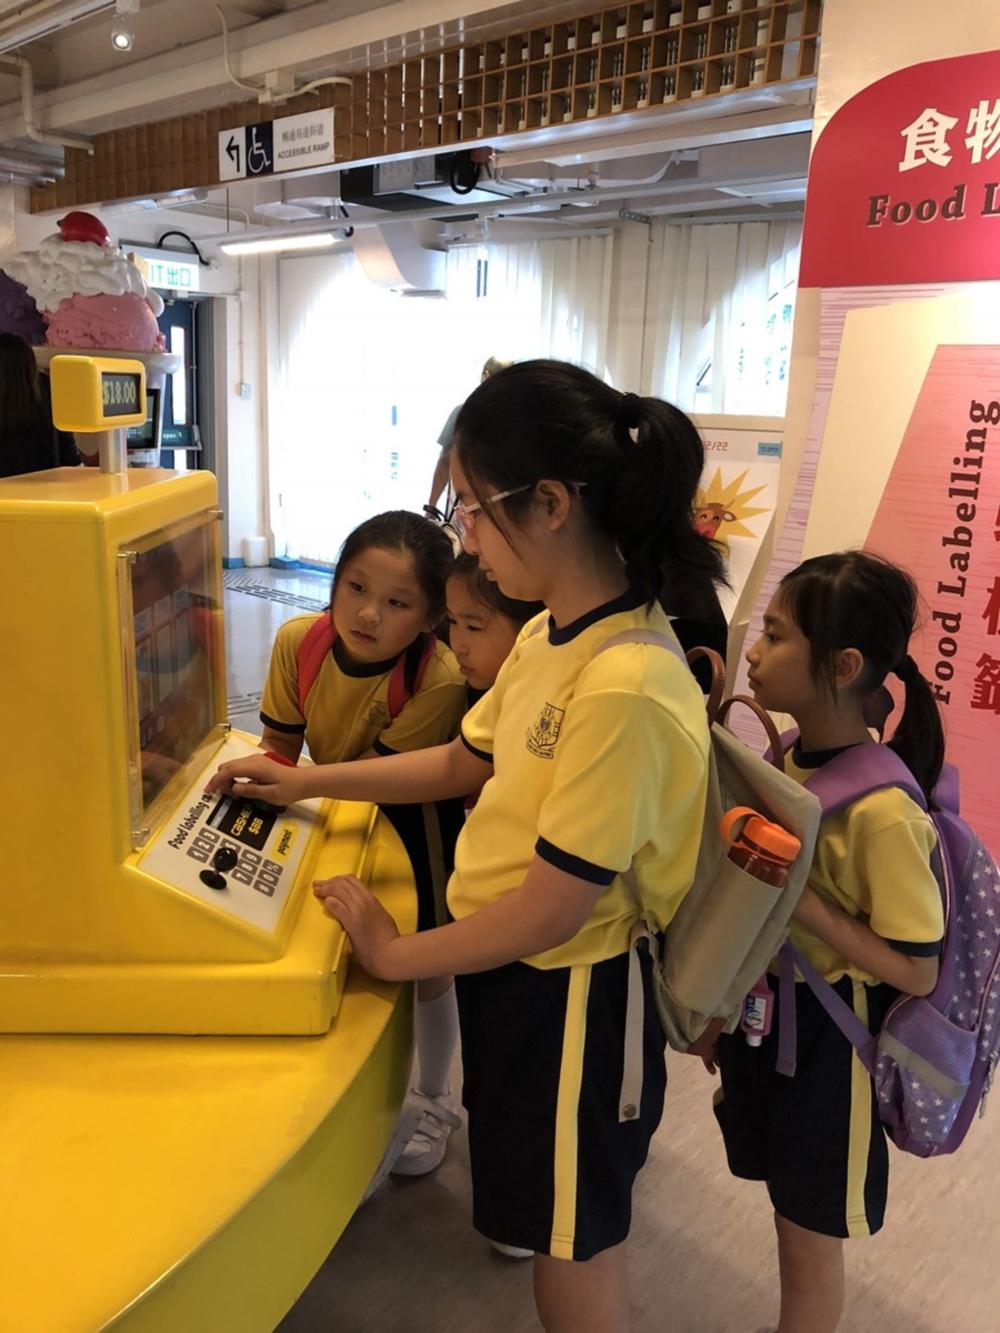 http://pohckwps.edu.hk/sites/default/files/48_7.jpg